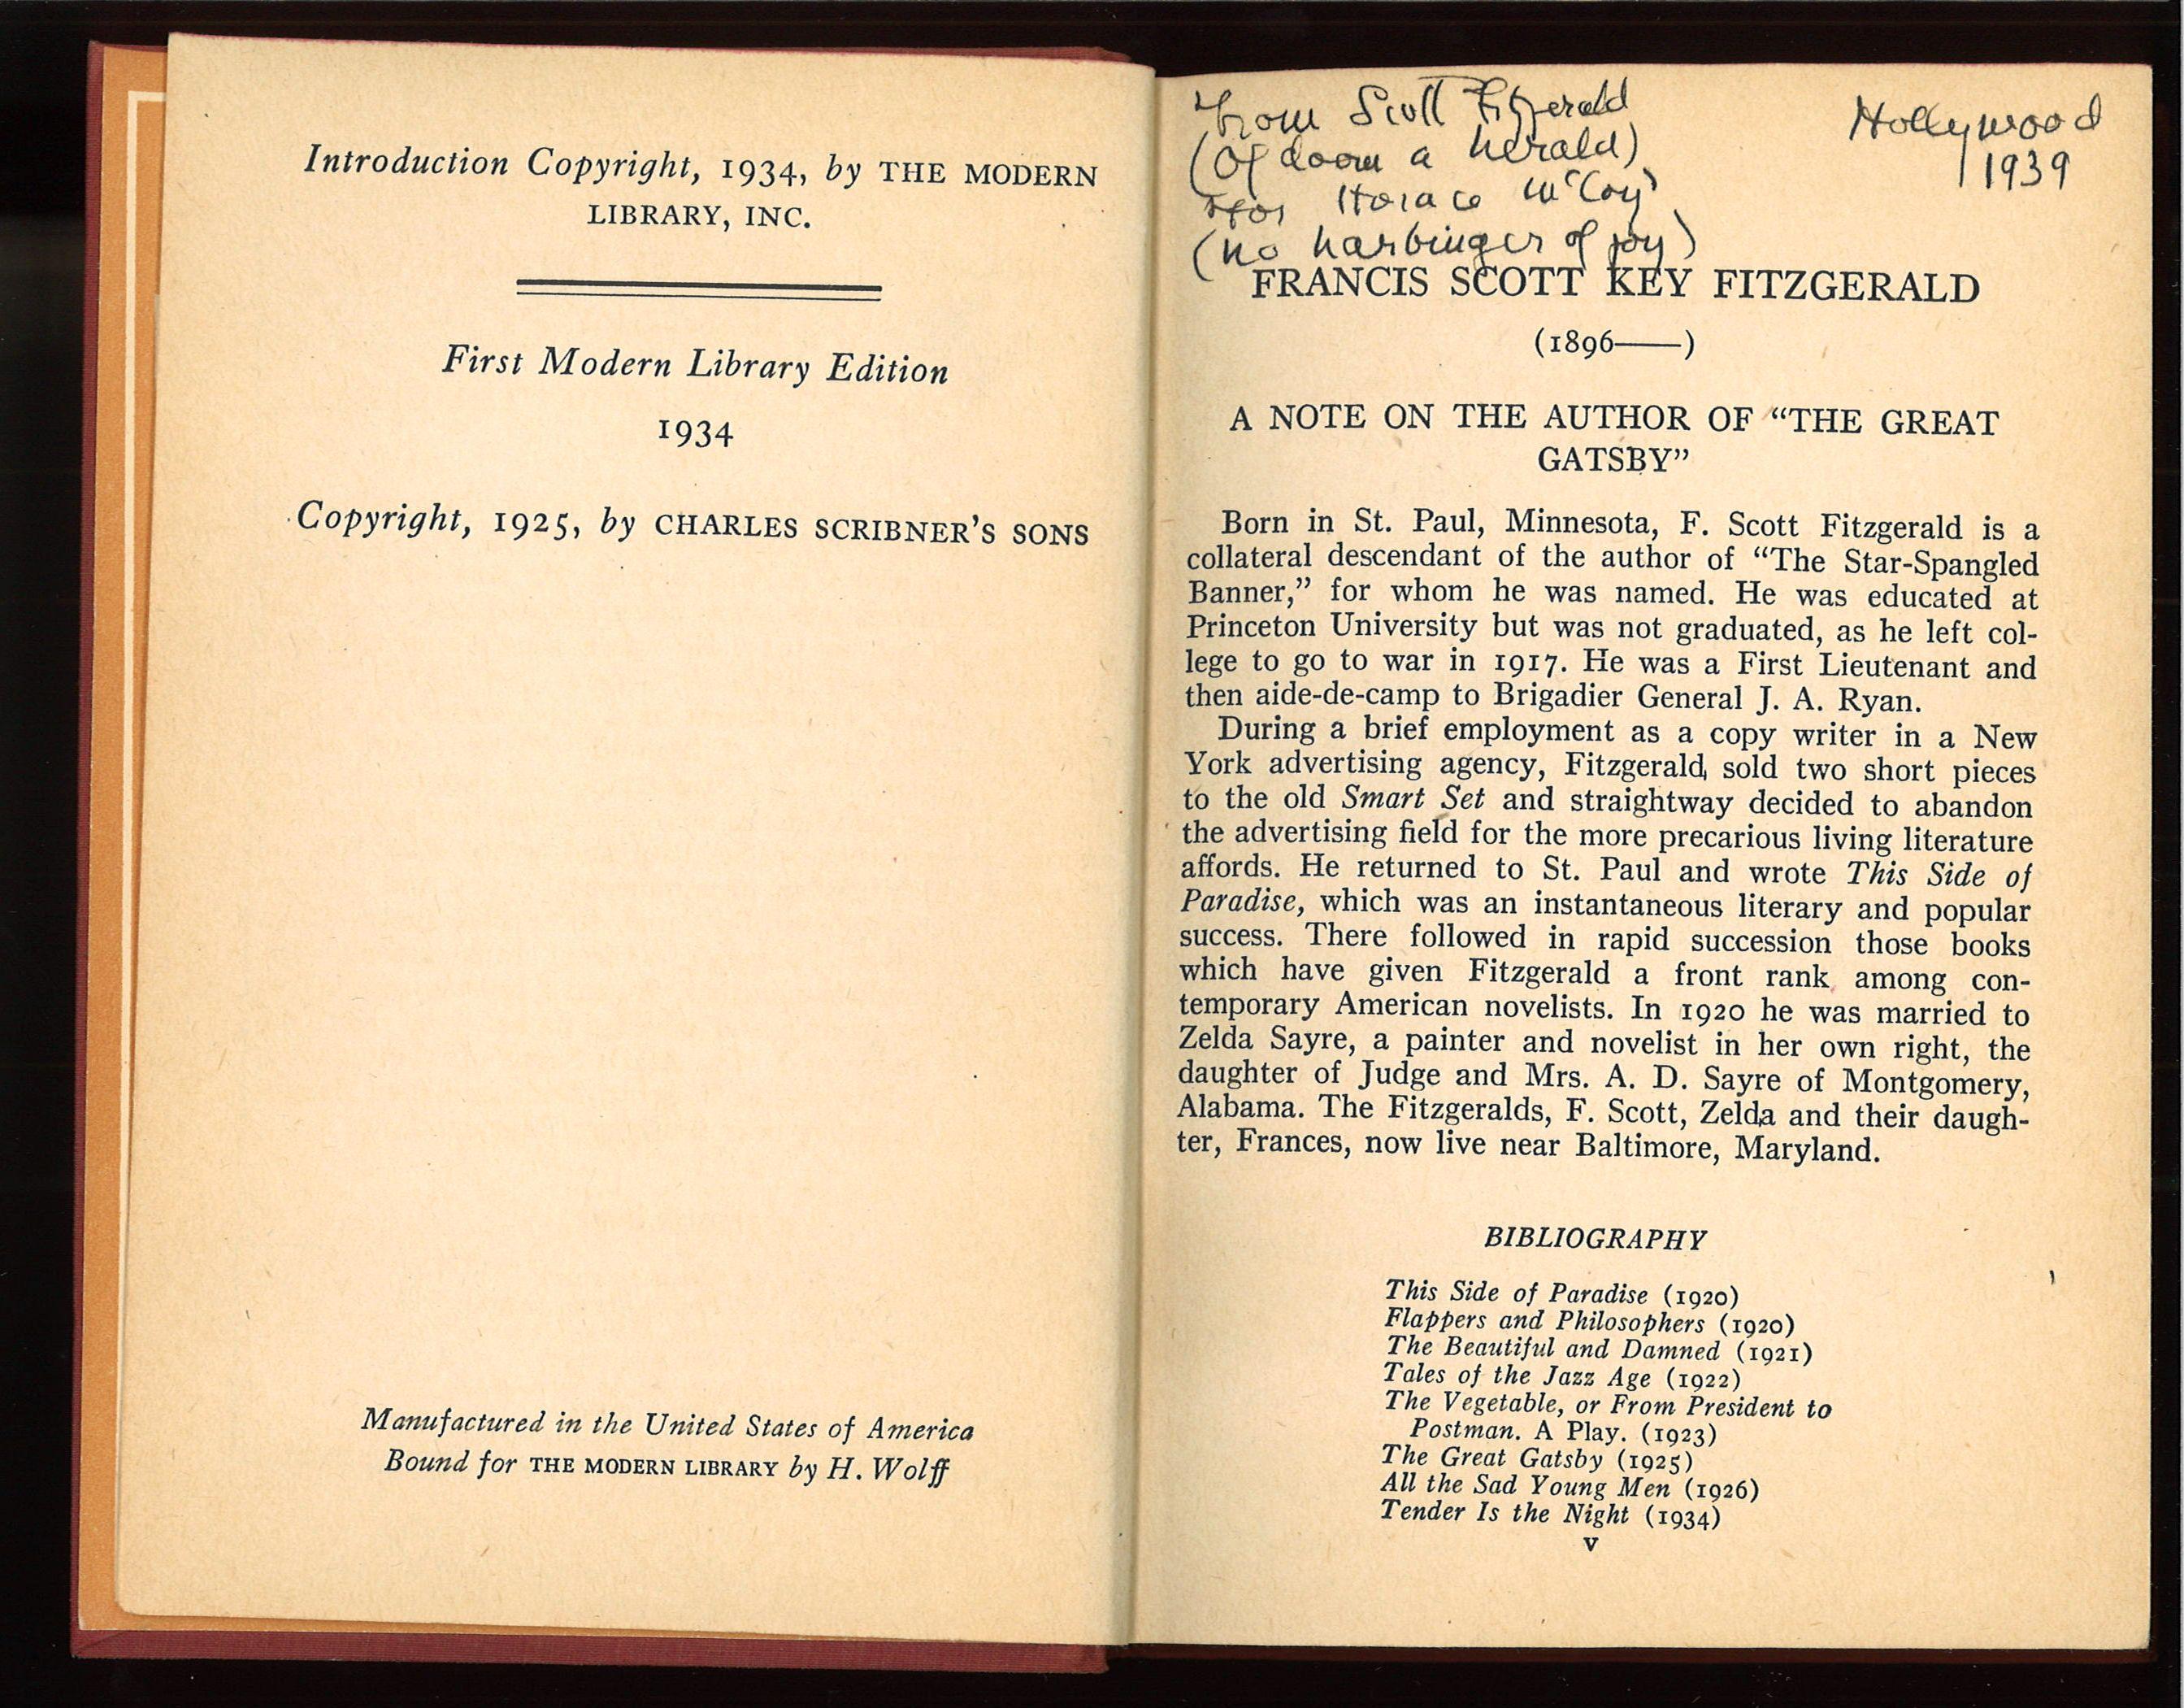 http://blogs.princeton.edu/rarebooks/images/2013.Legacy.Stewart.Trust.GG_002.jpg